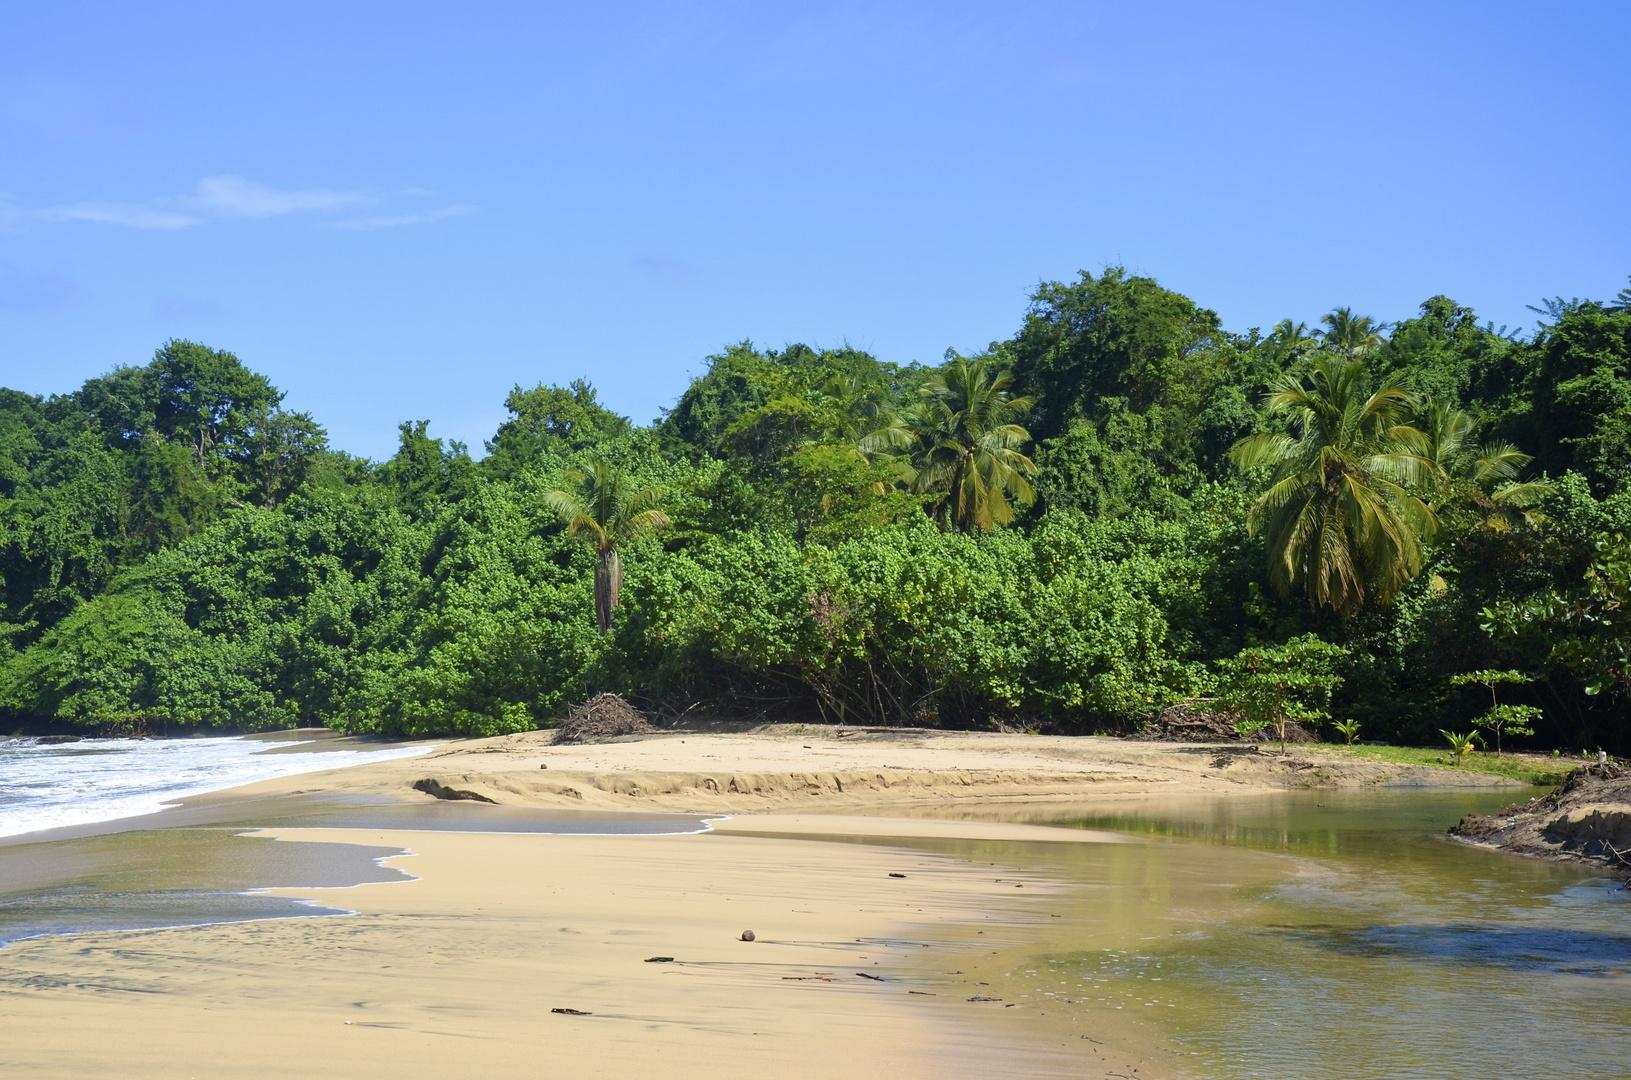 Strand in Dominica (SAS/2011)